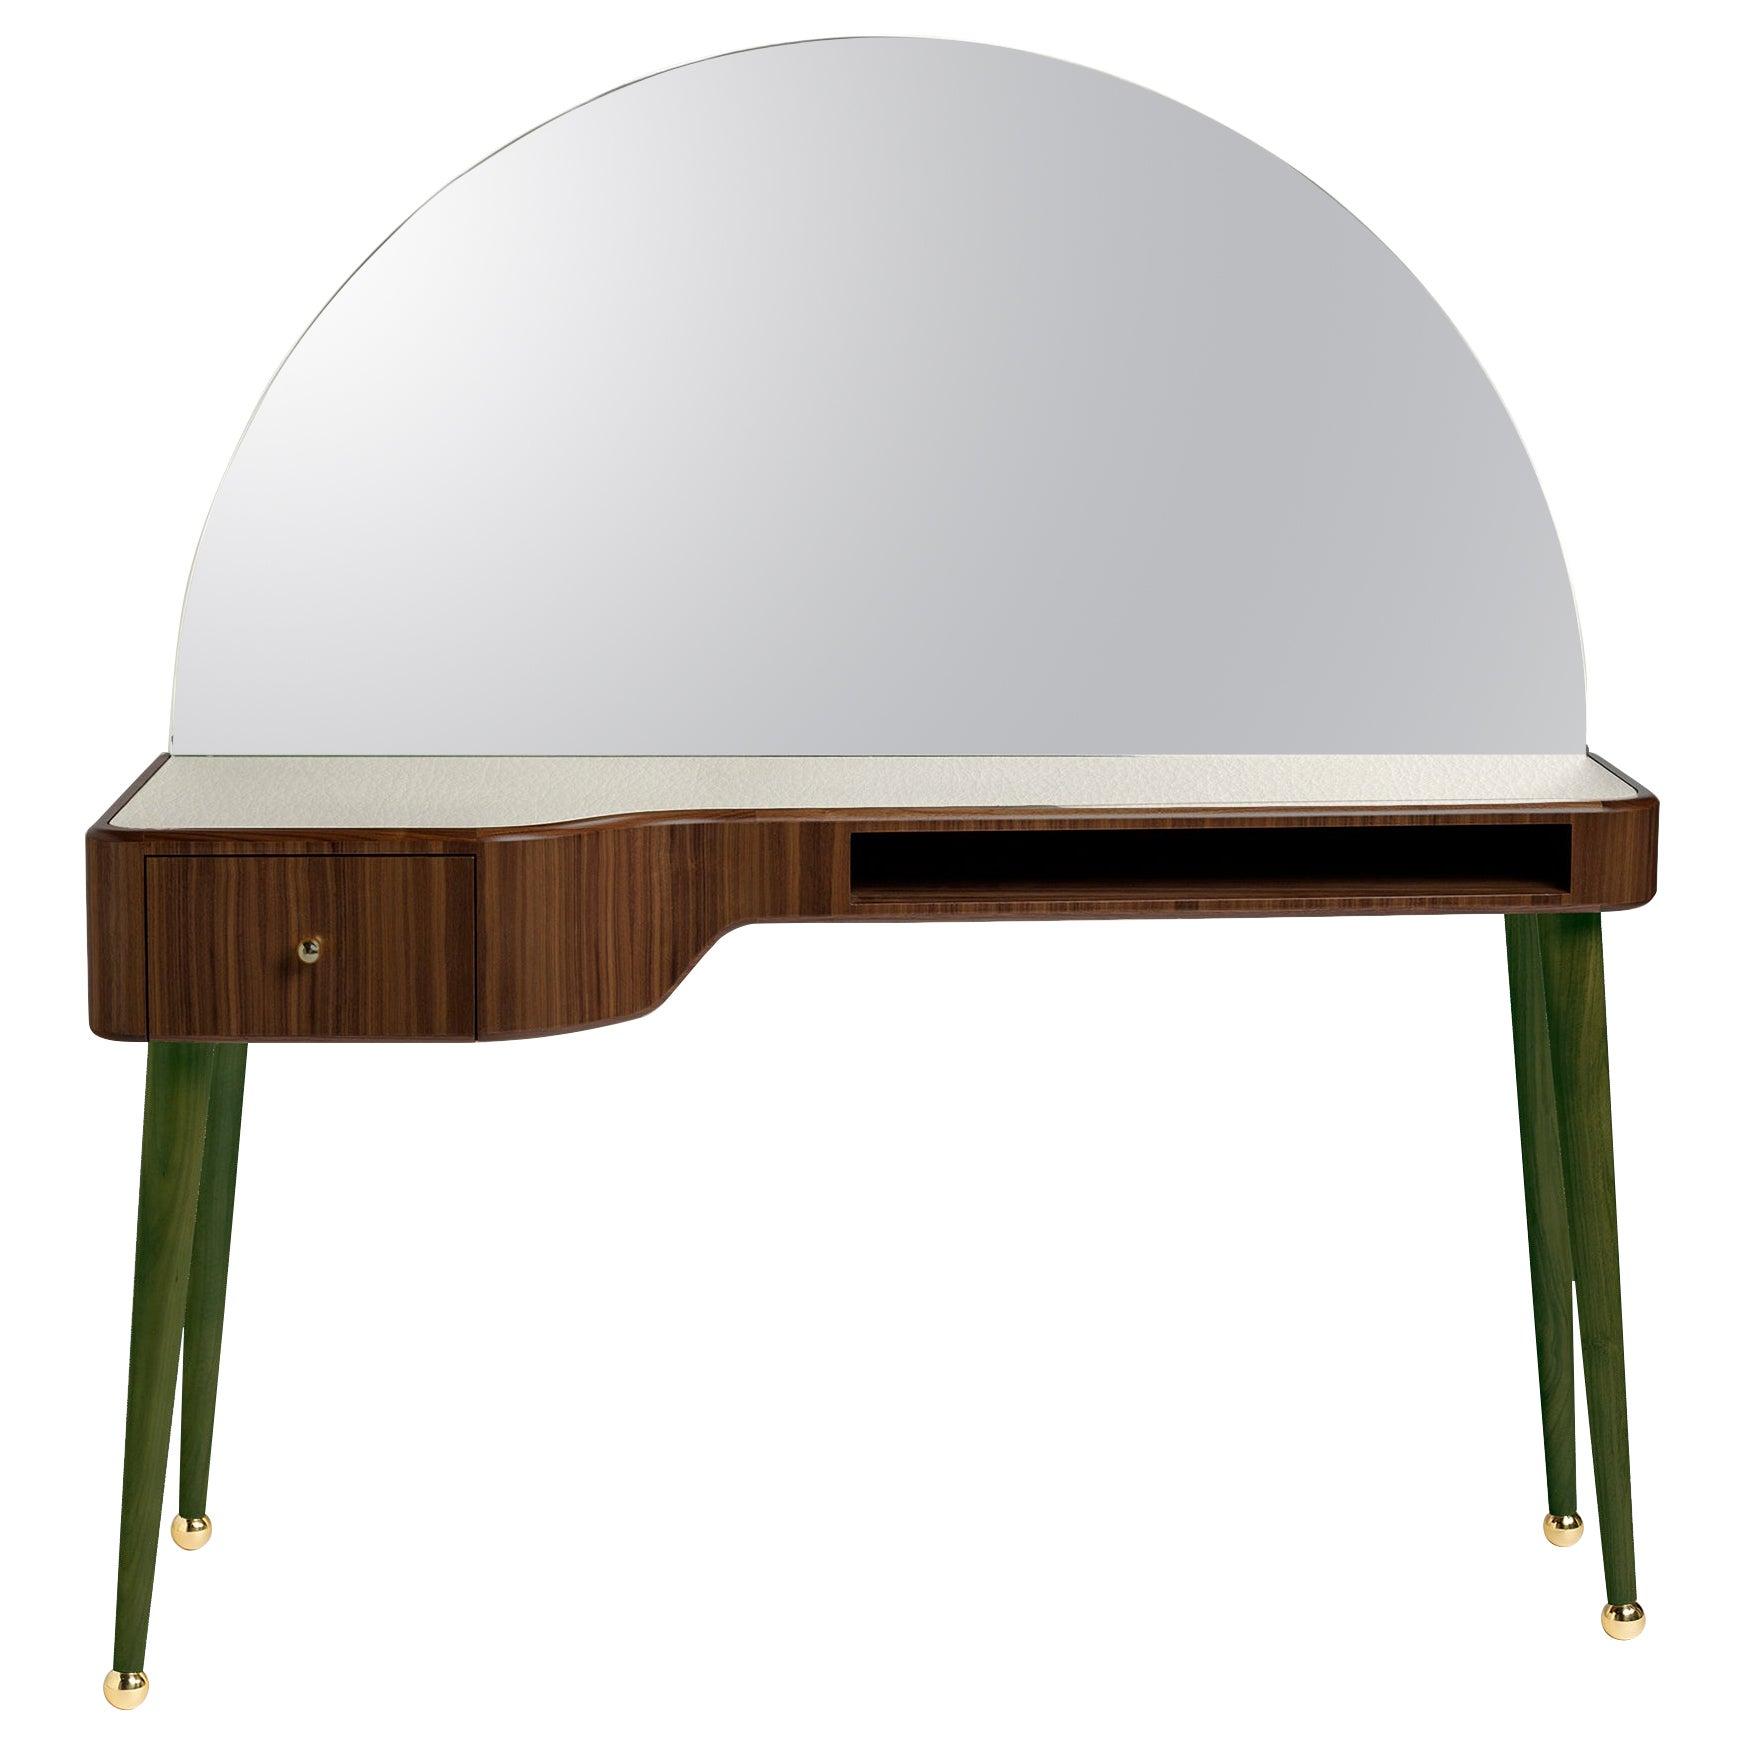 21st Century American Walnut Veneer Vanity Desk with Mirror, Green